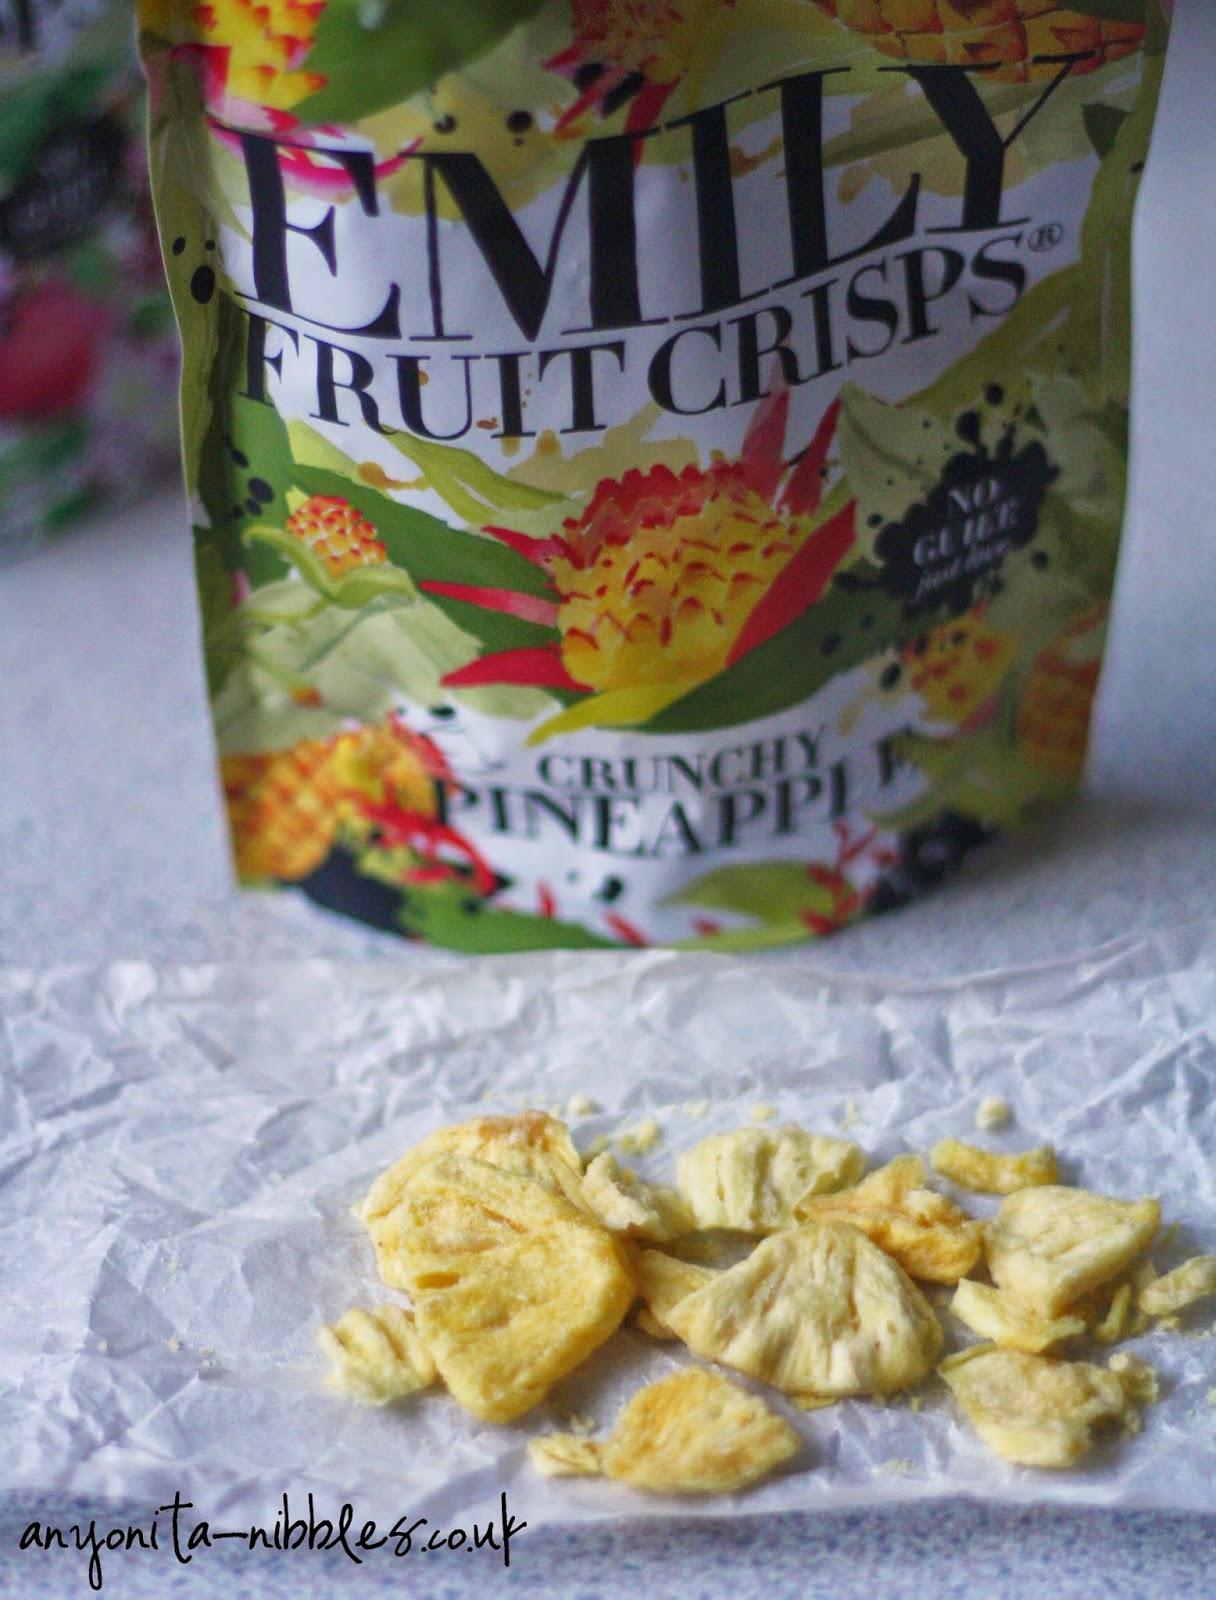 Crunchy Apple Emily Fruit Crisps by Anyonita-nibbles.co.uk